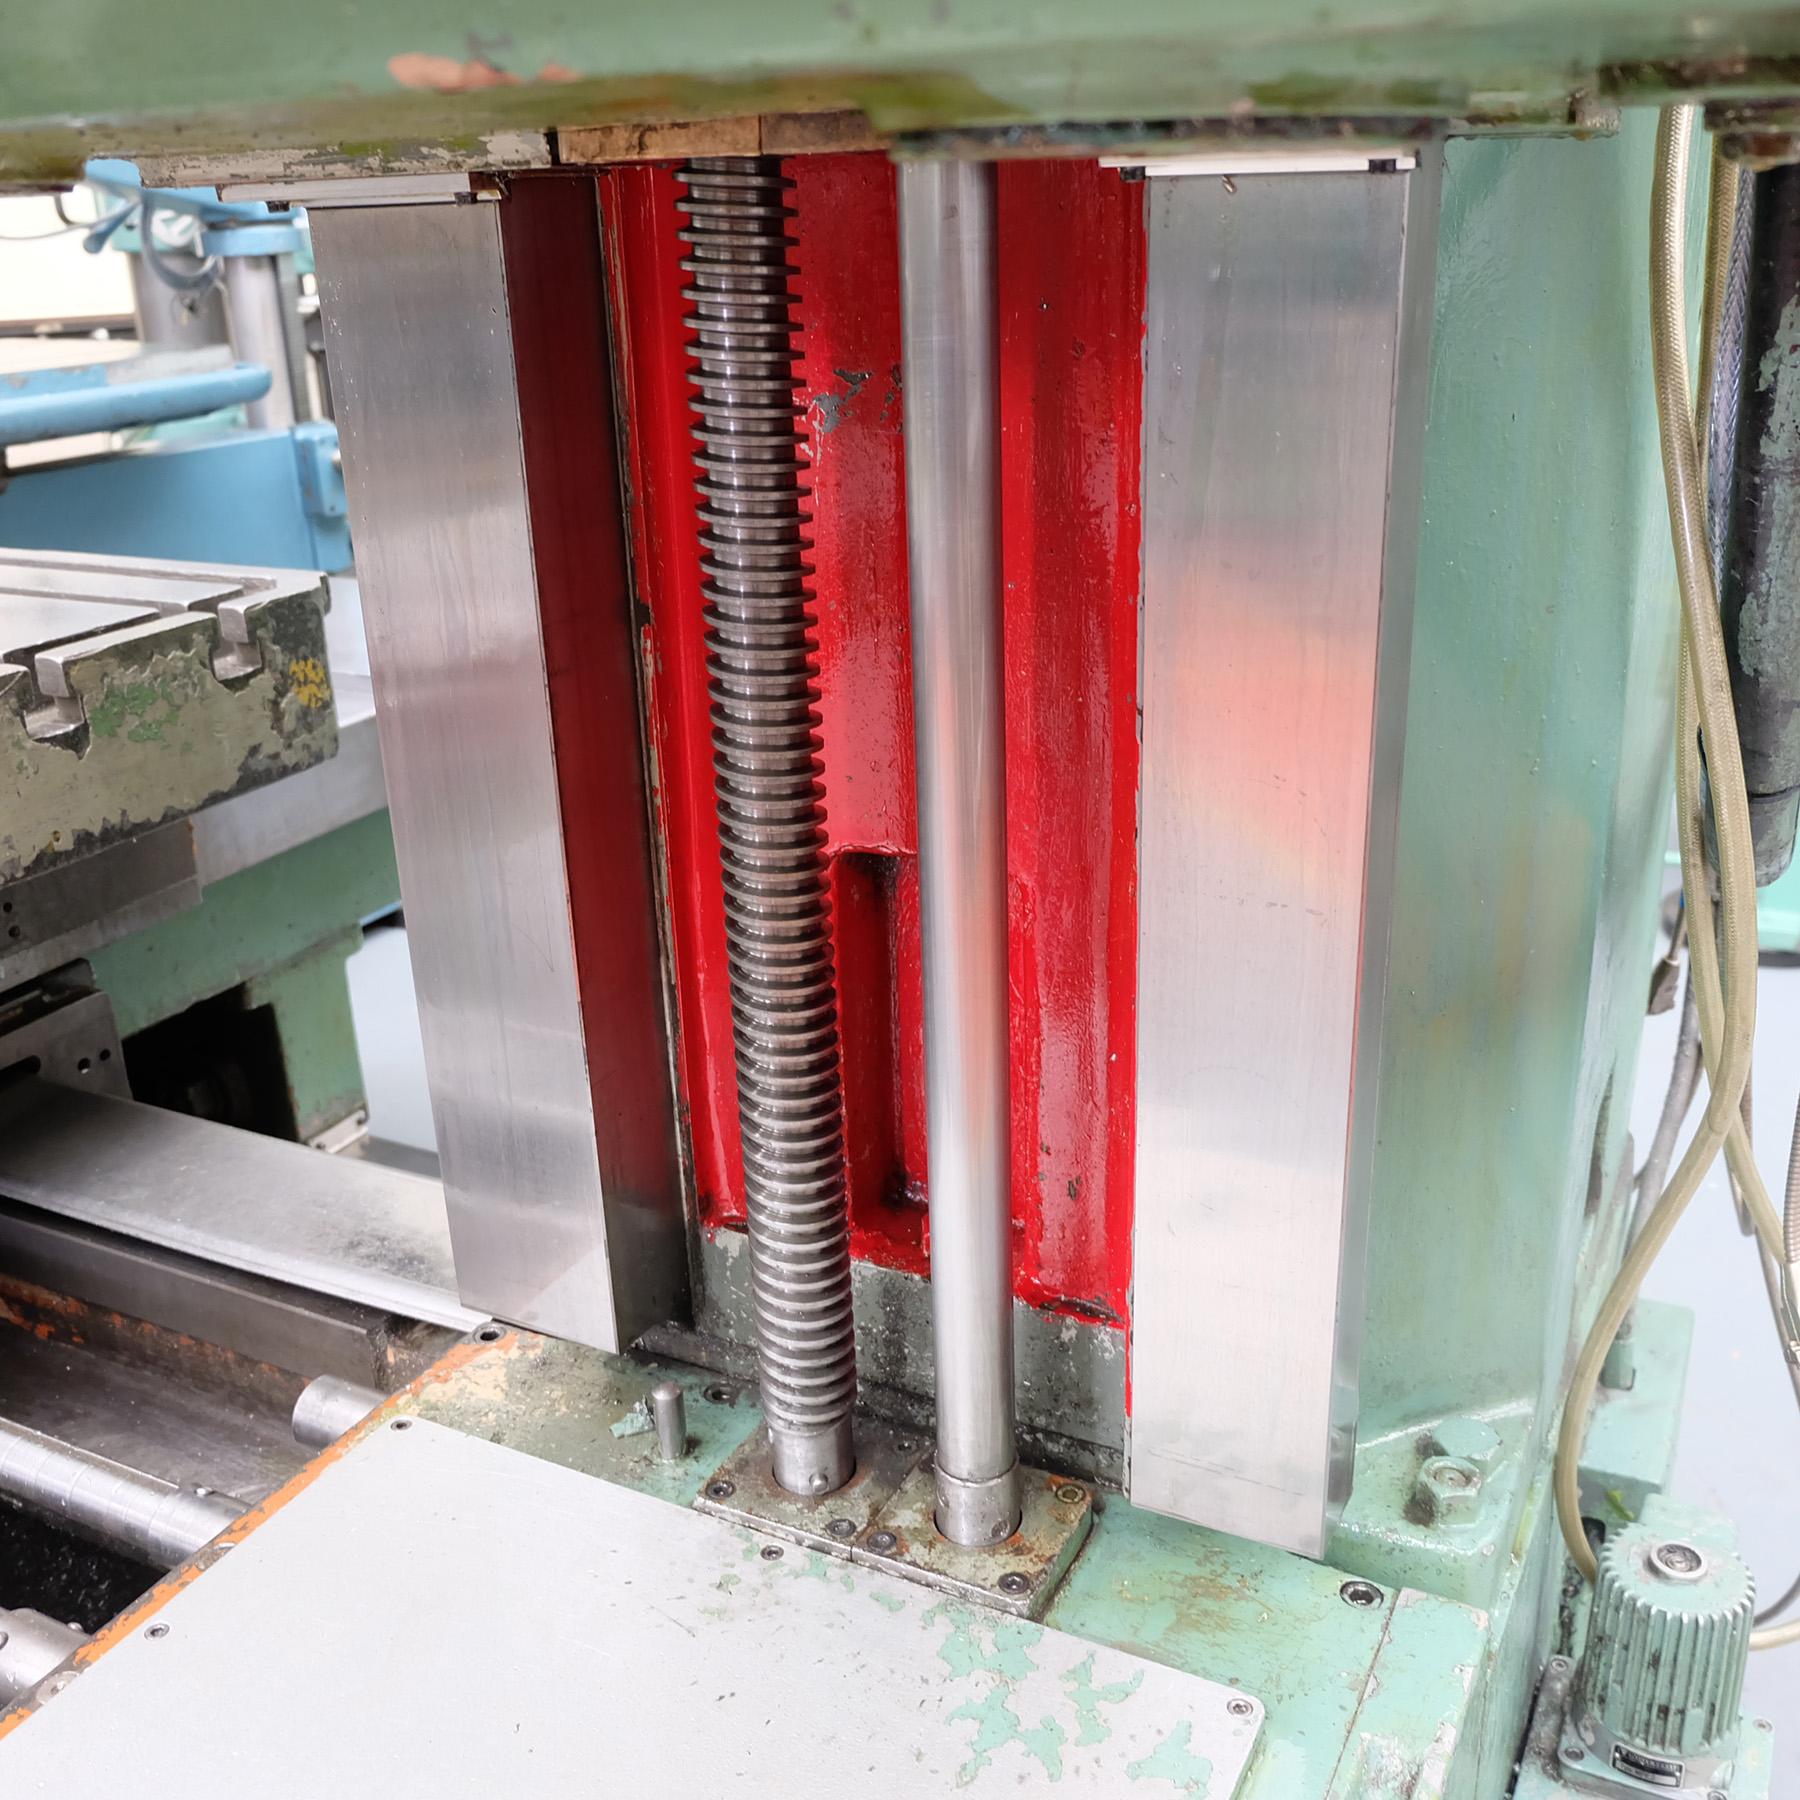 Ceruti Model ABC 75 Horizontal Boring & Milling Machine. With Tooling. - Image 10 of 15